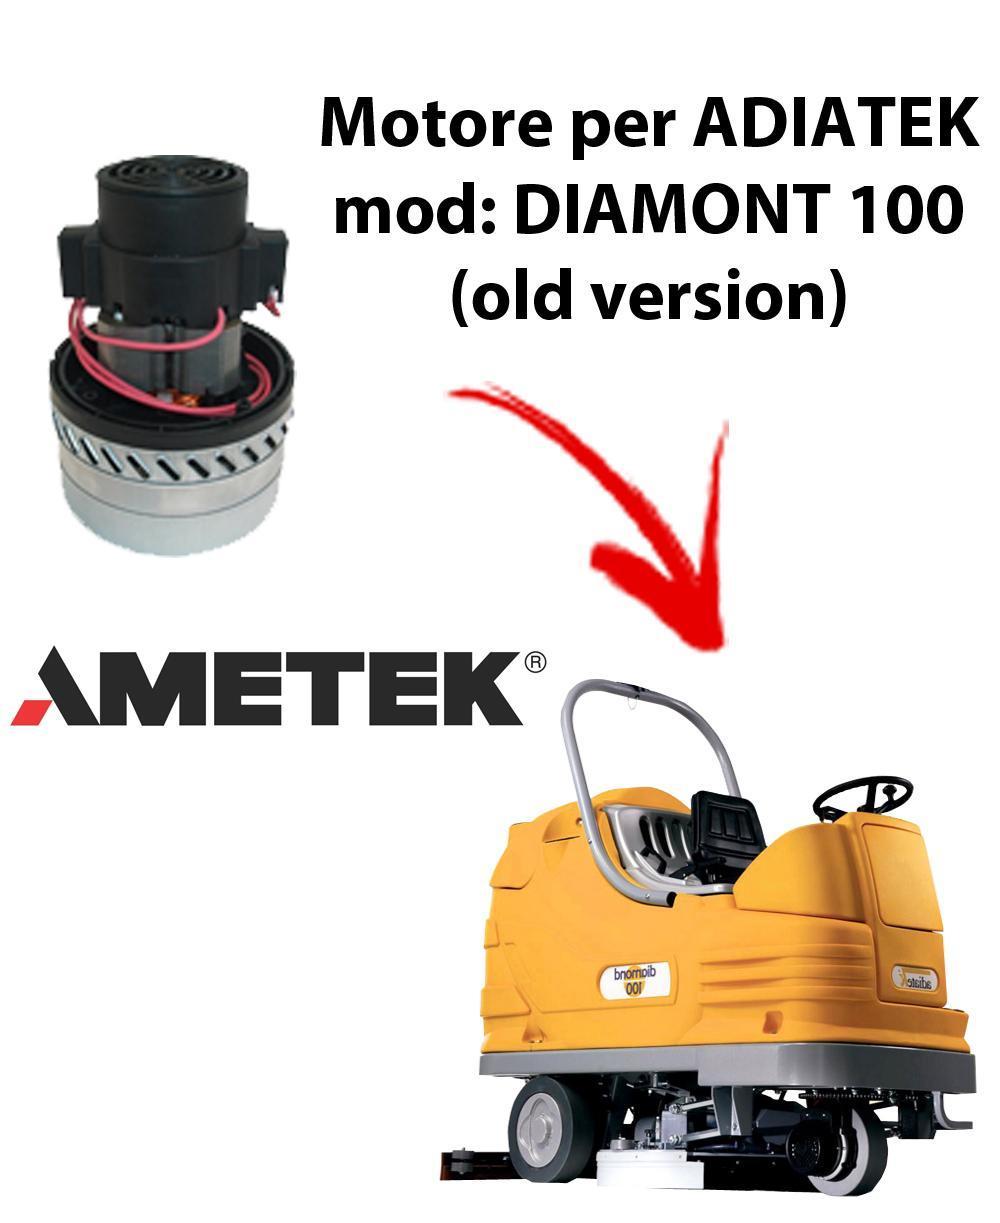 Diamond 100  Ametek Vacuum Motor  Italia for scrubber dryer Adiatek